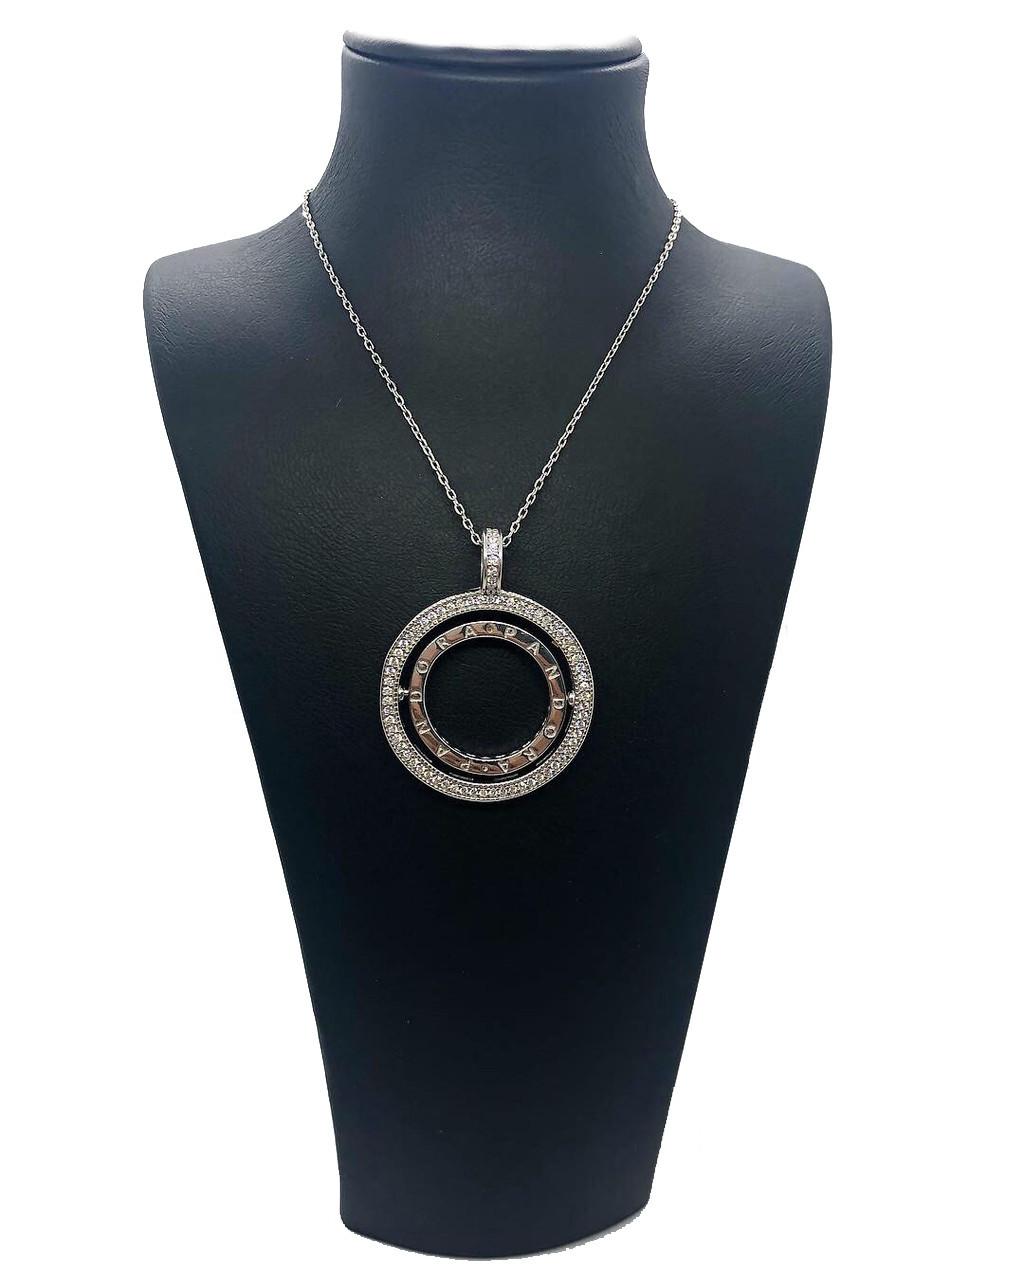 "Двухсторонний вращающийся кулон из серебра 925 My Jewels в стиле Pandora модель ""Вращающиеся сердца"""